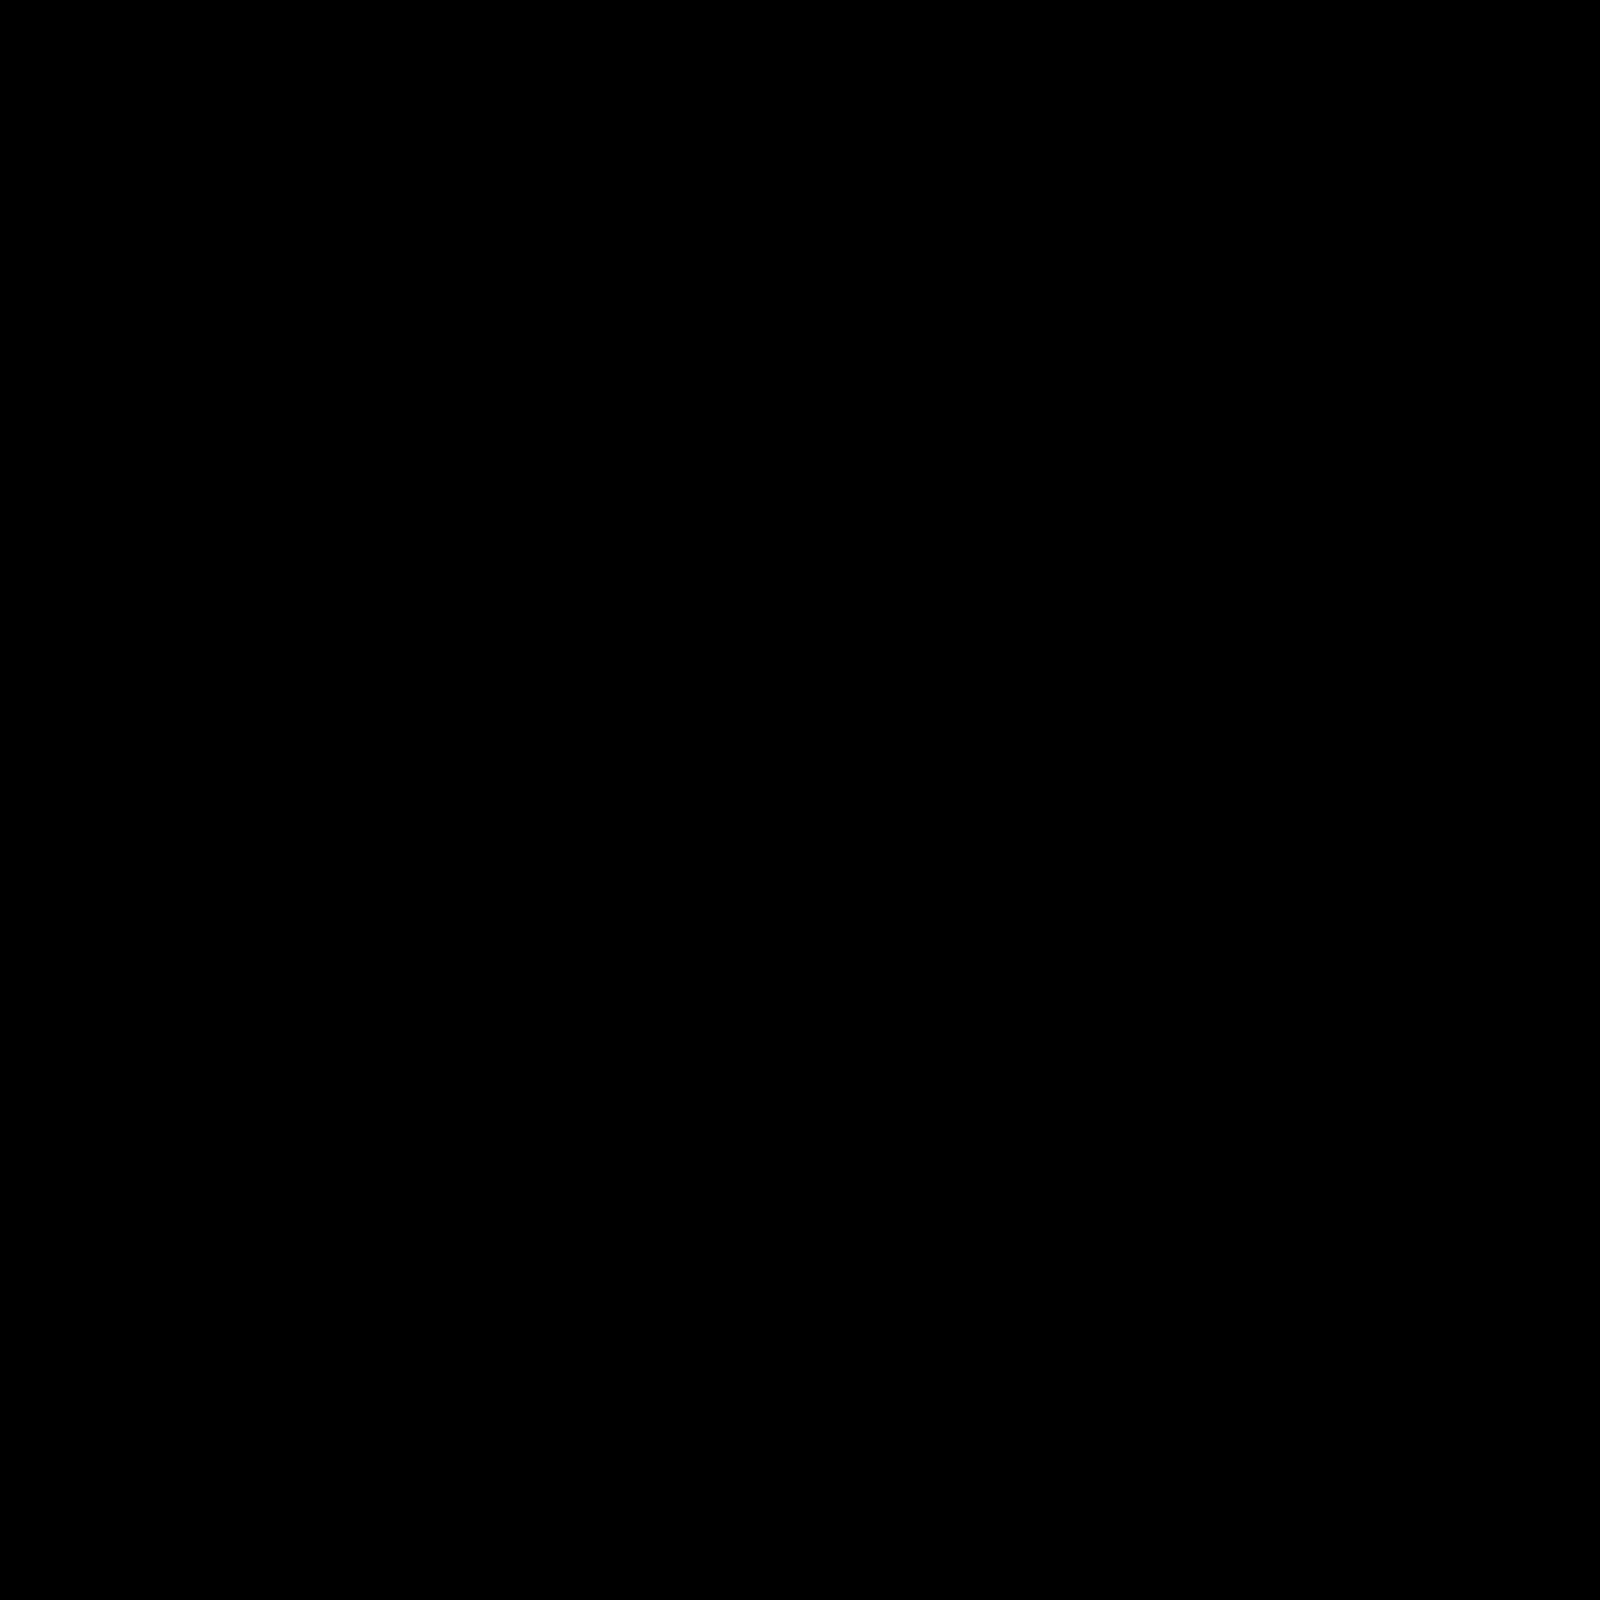 Exhibition icon